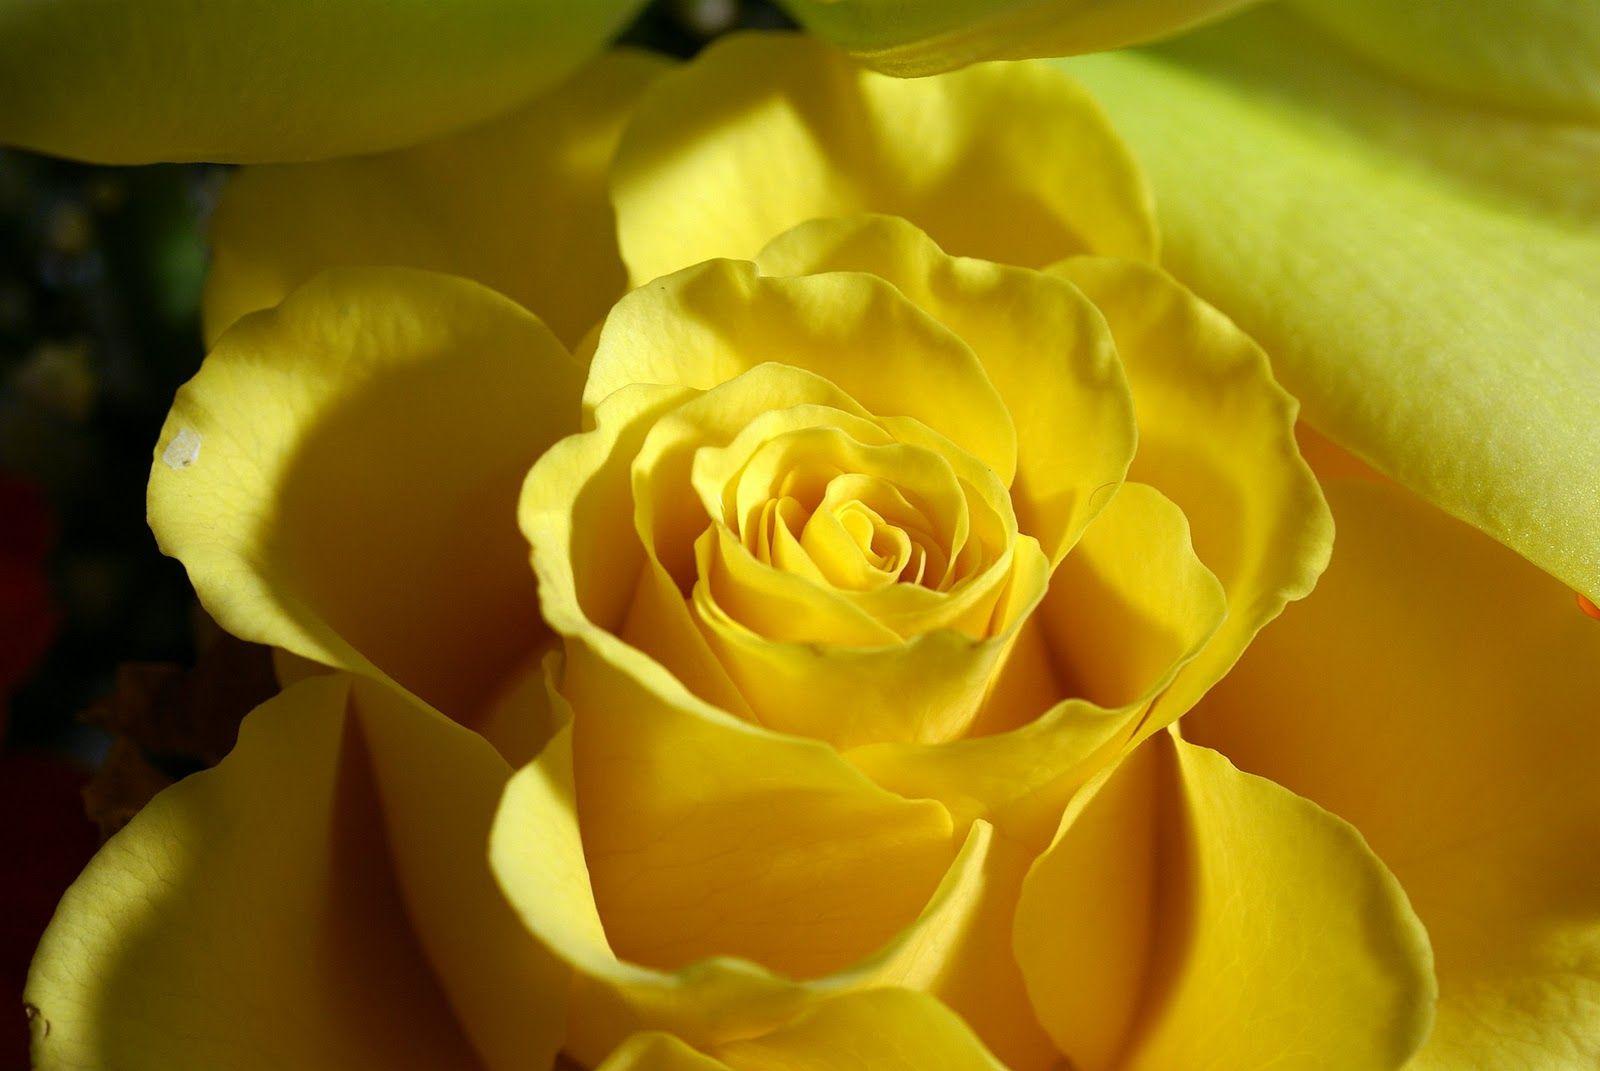 Moons Flower Yellow Flower Wallpaper Yellow Roses Rose